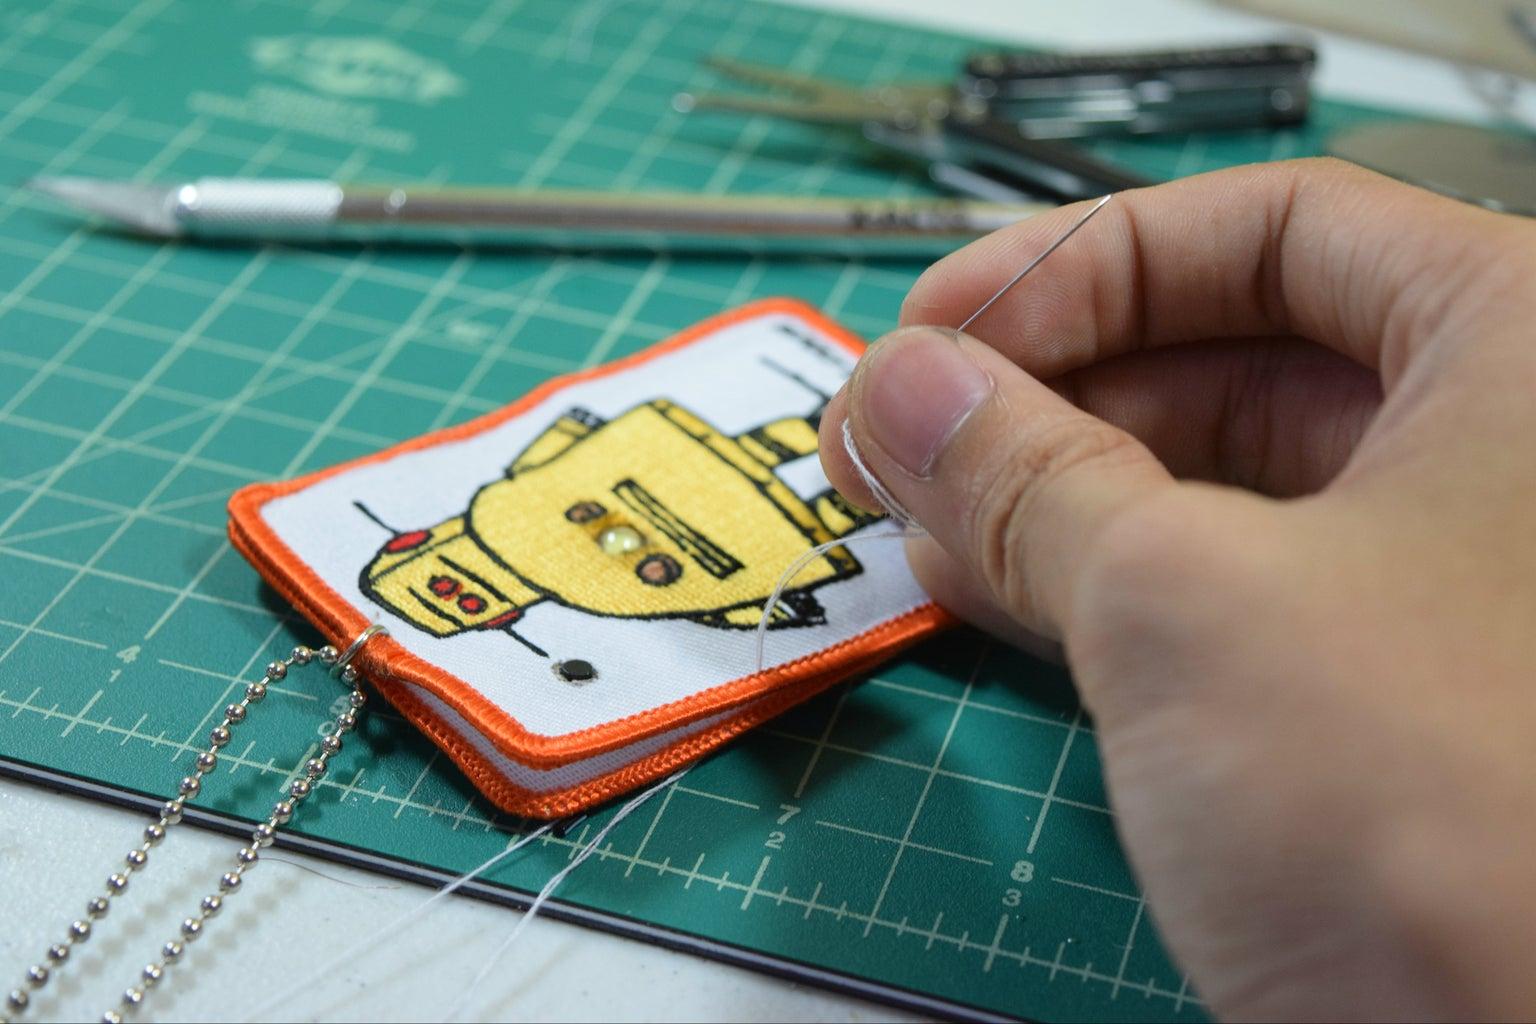 Sewing - Borrow Mom's Sewing Kit